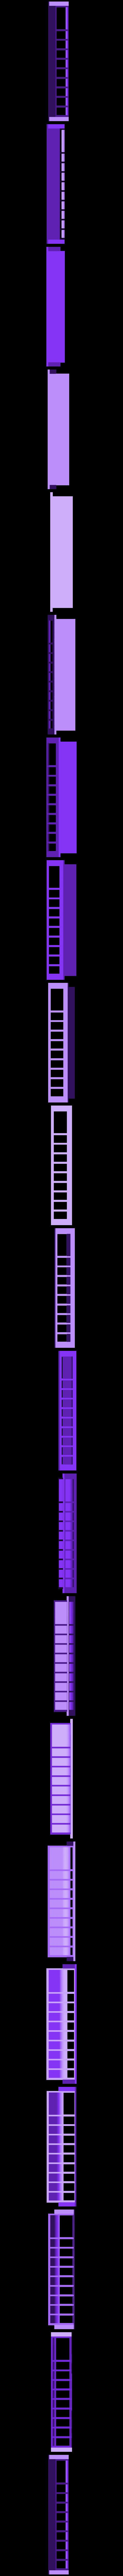 etage 4.stl Download STL file Module for mini drill and c is accessory N ° 2 • 3D printer model, prusai33